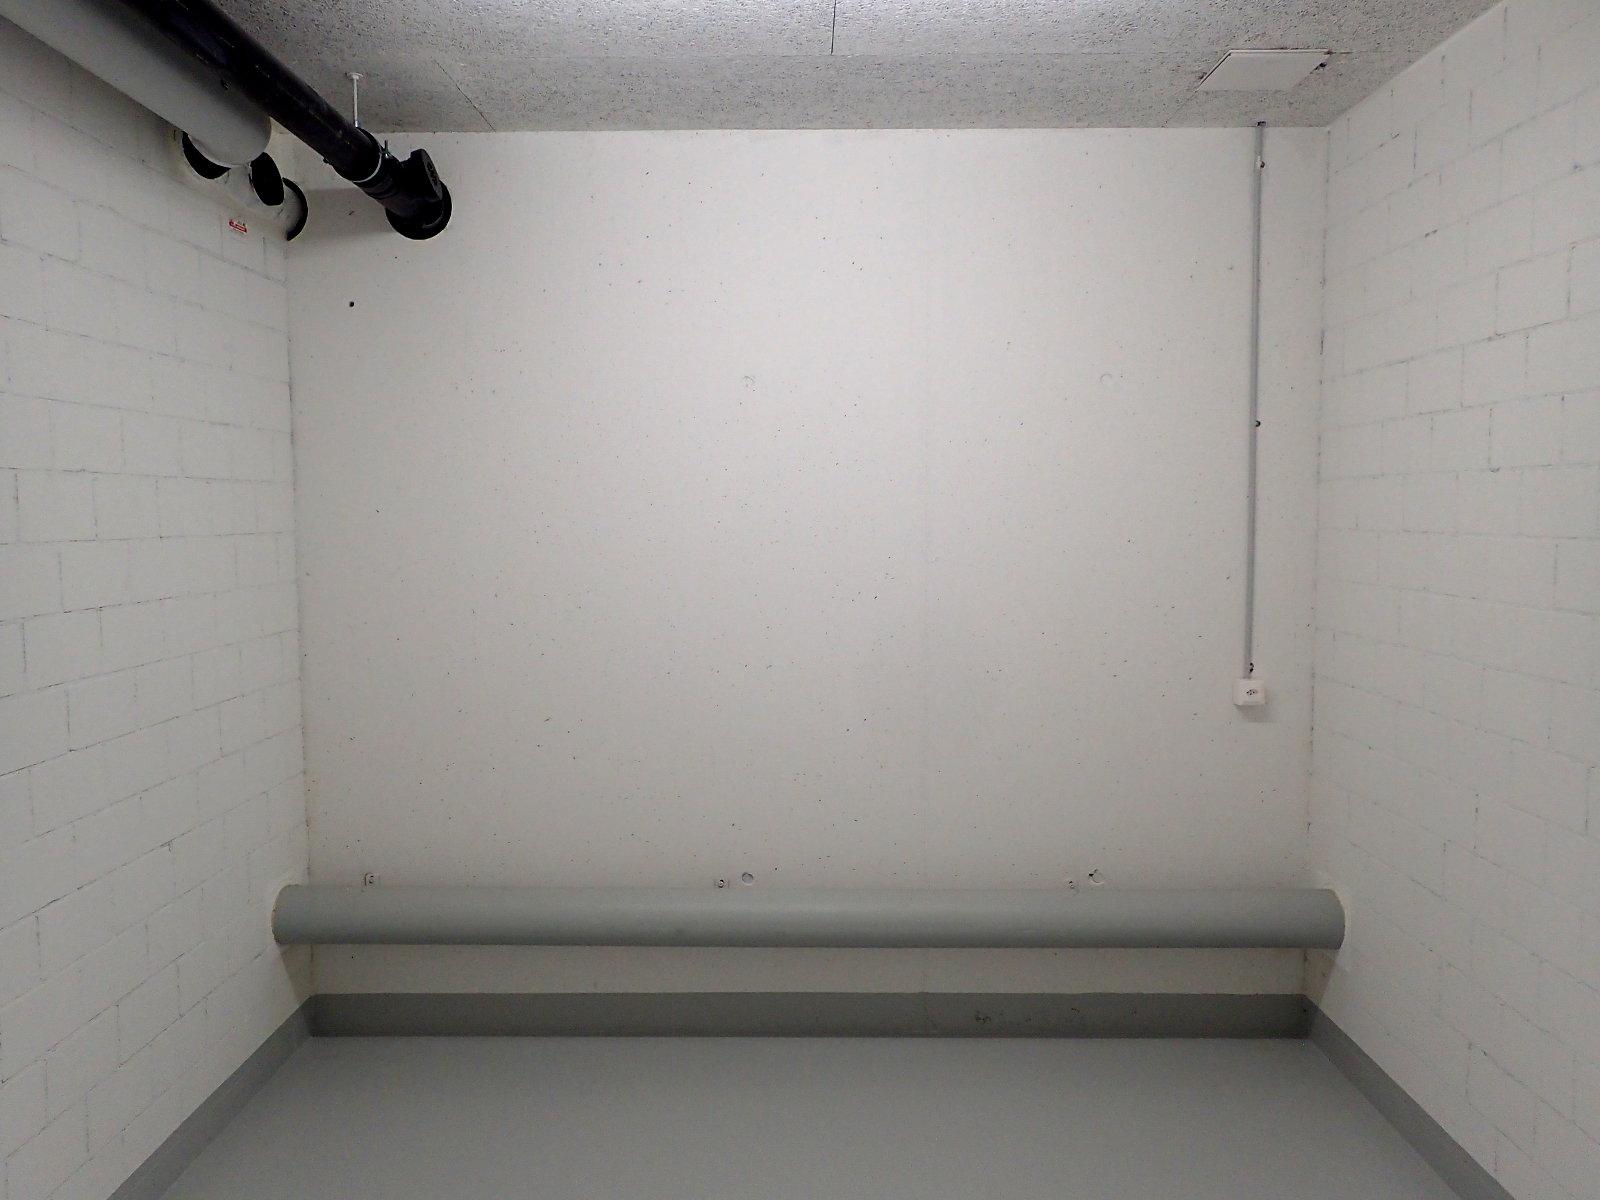 Full Size of Olympus Digital Camera Küche Lagerfläche Mieten